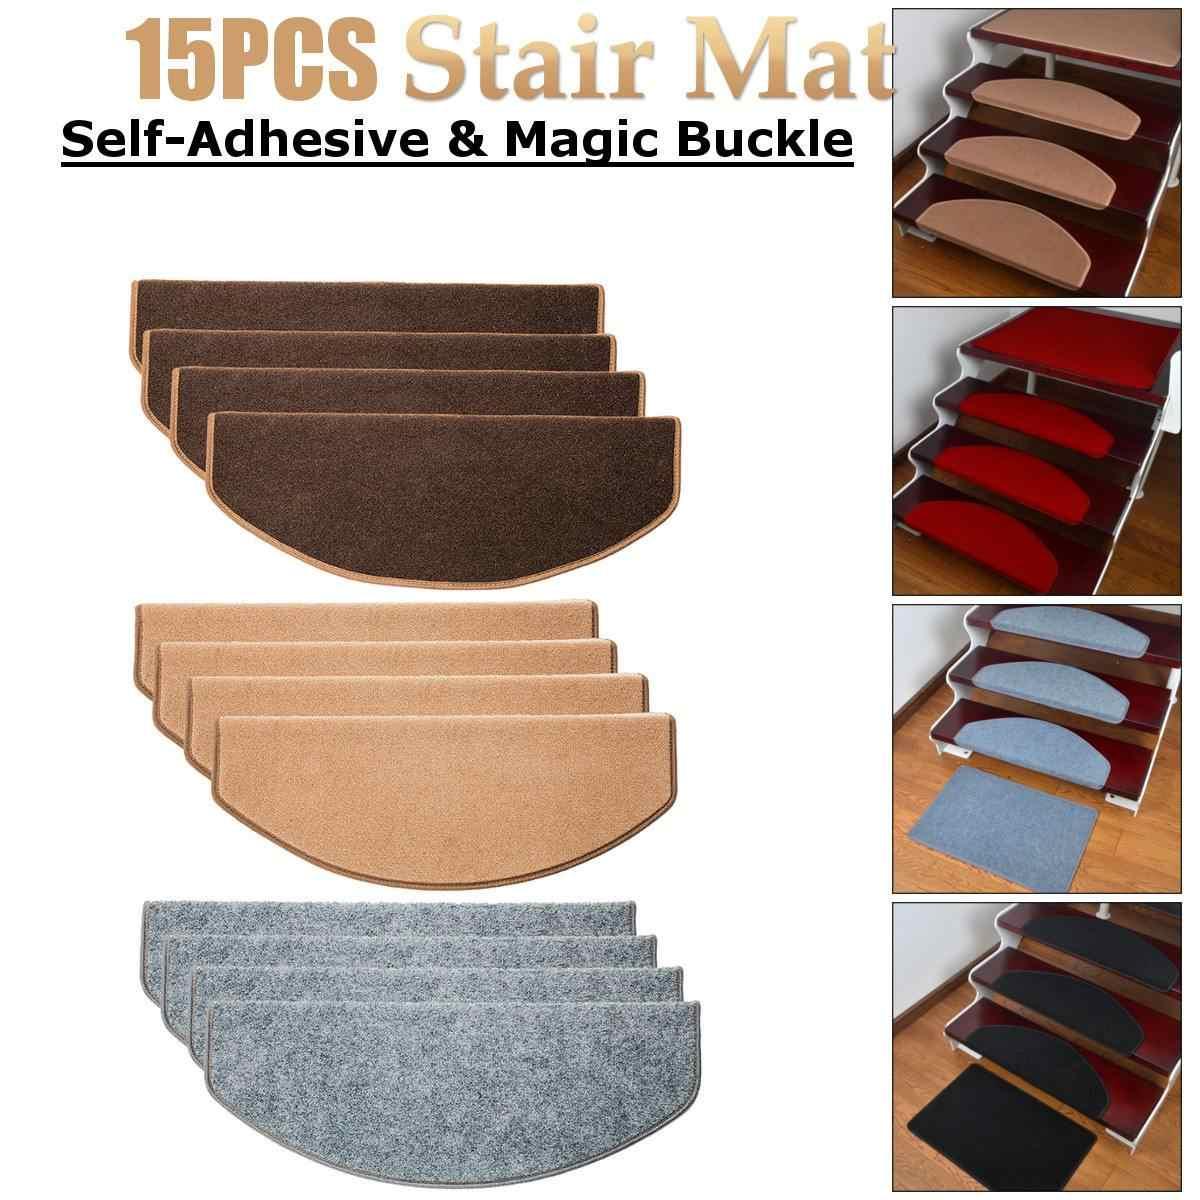 15pcs Stair Tread Carpet Mats Self Adhesive Stair Mat Stair Mat Anti Skid Step Rugs Safety Mute Floor Mats Indoor Warm Pad 55x21 Mat Aliexpress